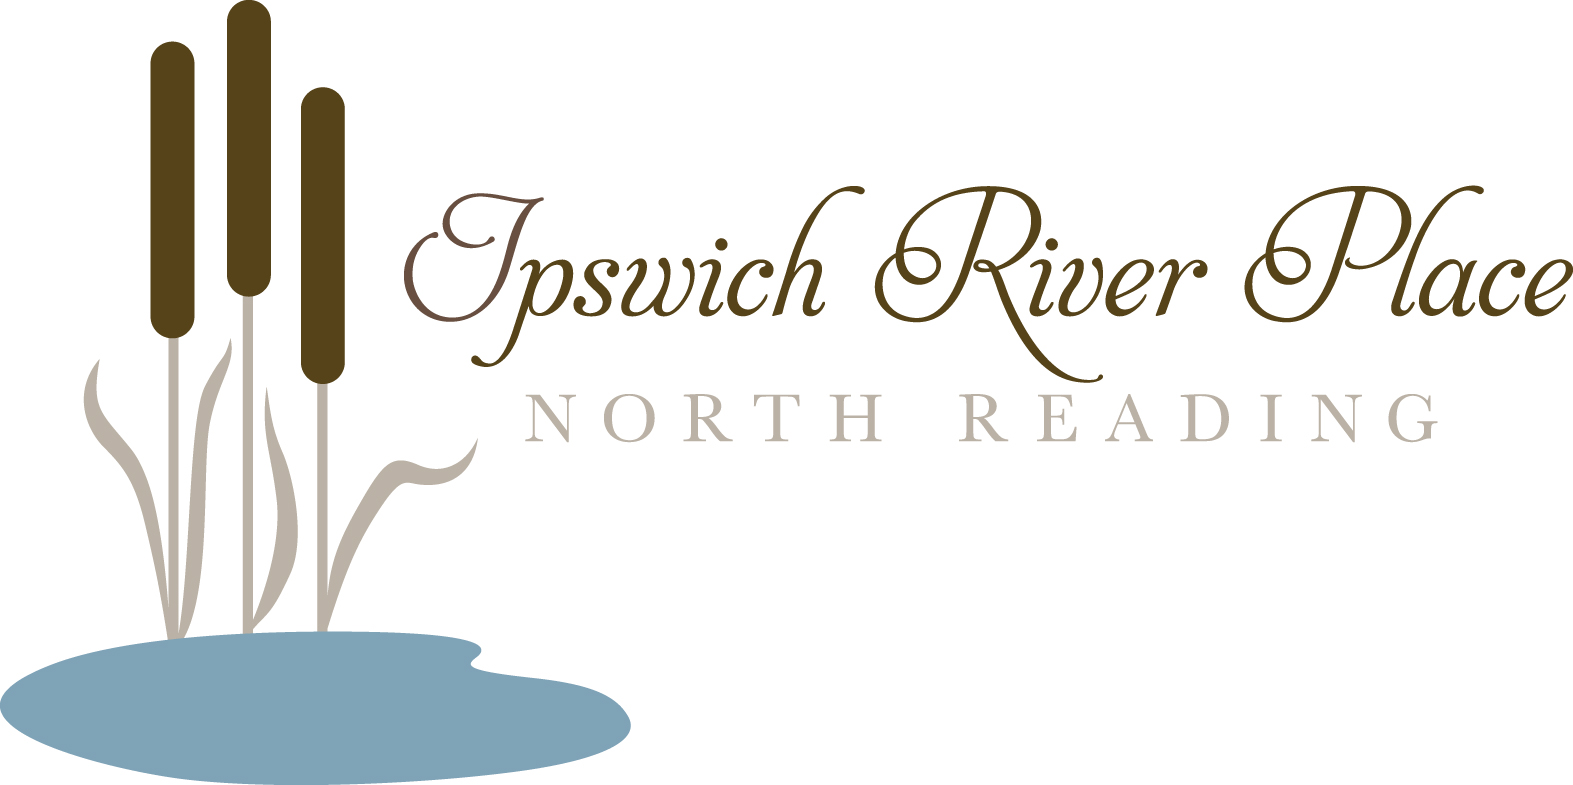 IpswichRiverPlace_logo